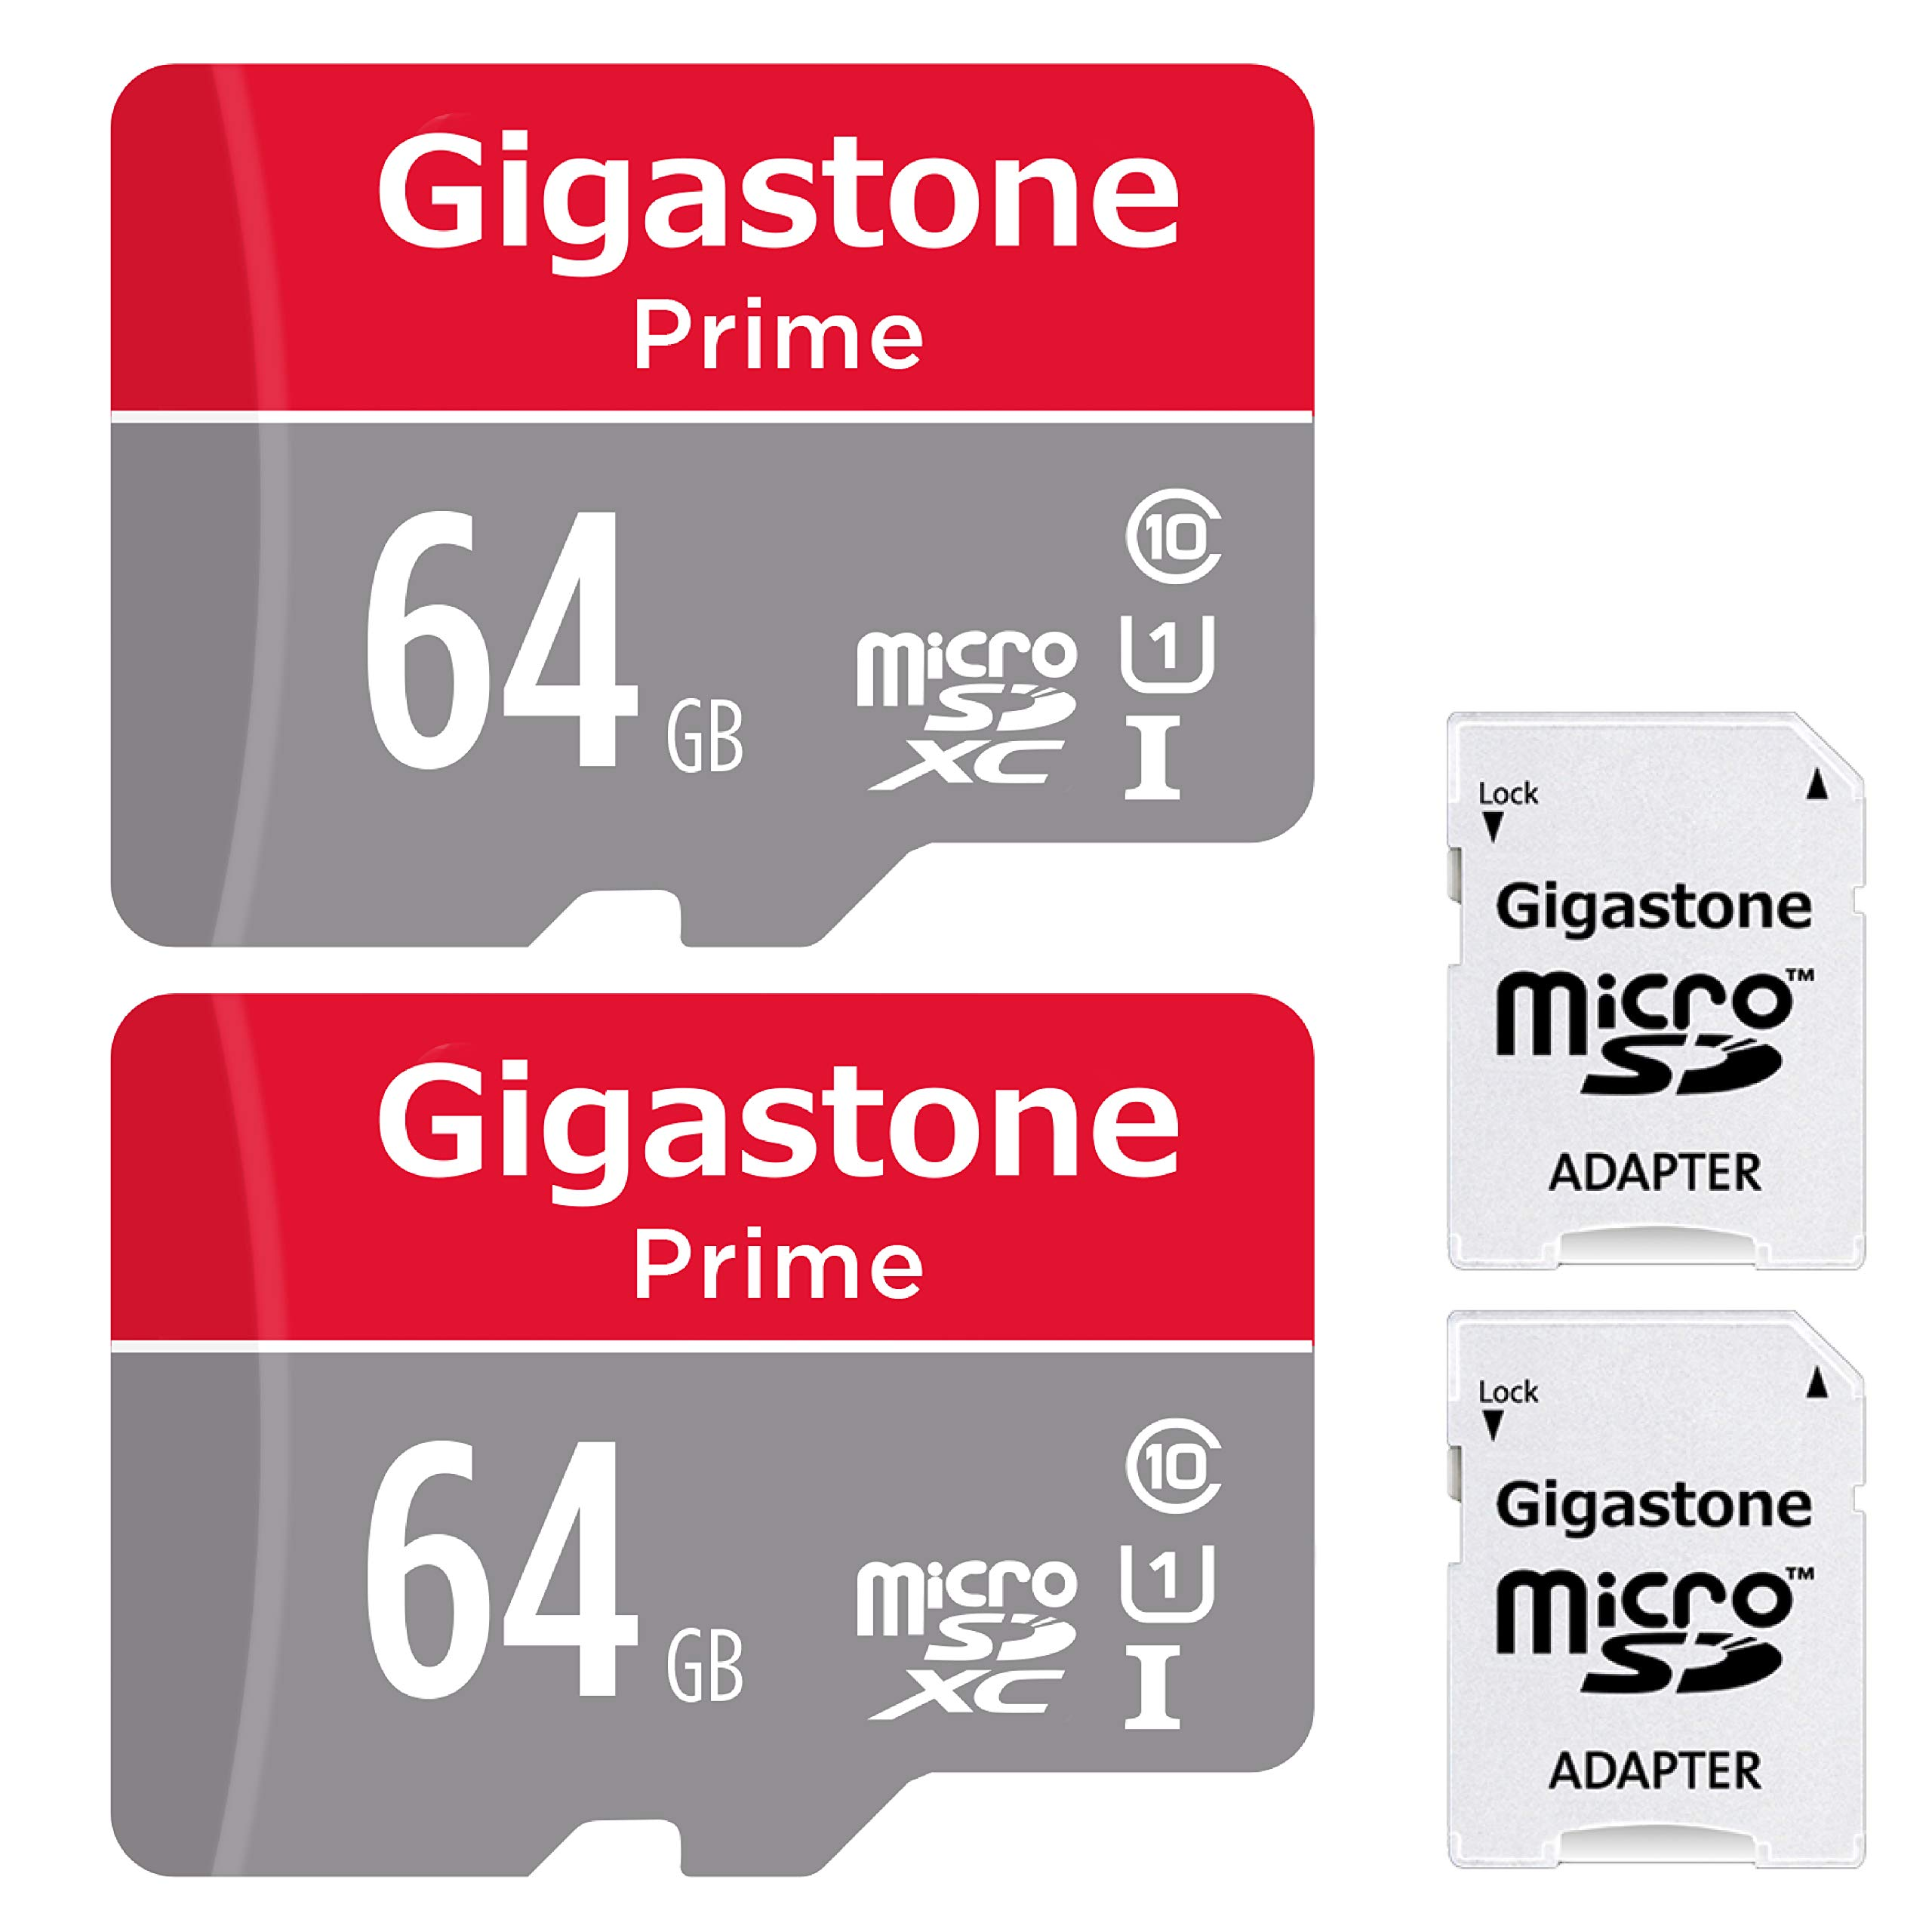 Gigastone Micro SD Card 64GB 2-Pack MicroSD XC U1 C10 with Mini Case and MicroSD to SD Adapter High Speed Memory Card Class 10 UHS-I Full HD Video Nintendo Gopro Camera Samsung Canon Nikon DJI Drone by Gigastone